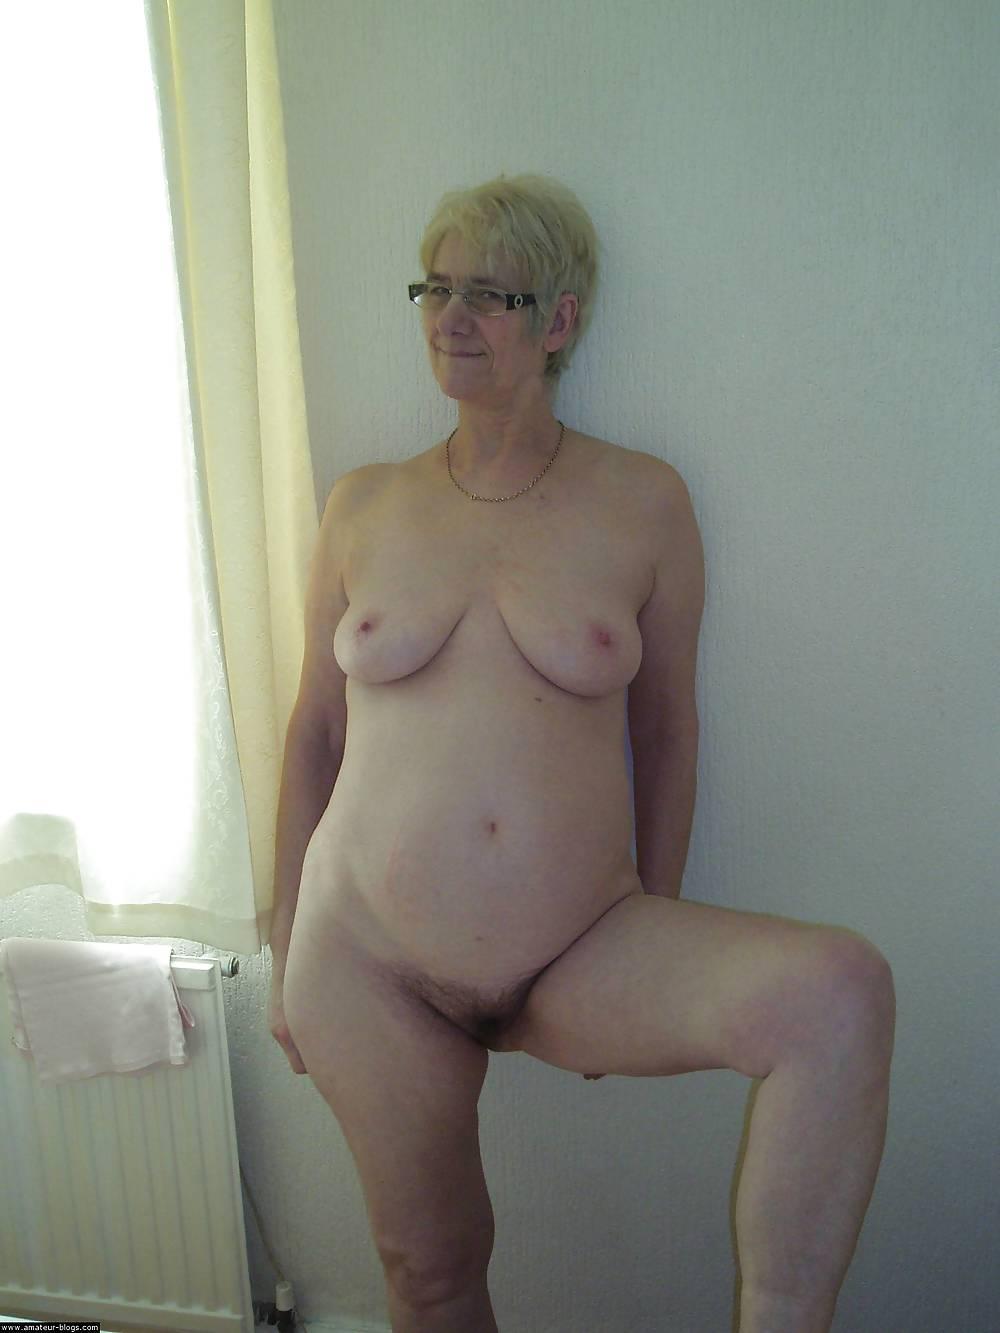 hardcore pics from real women over 50ten